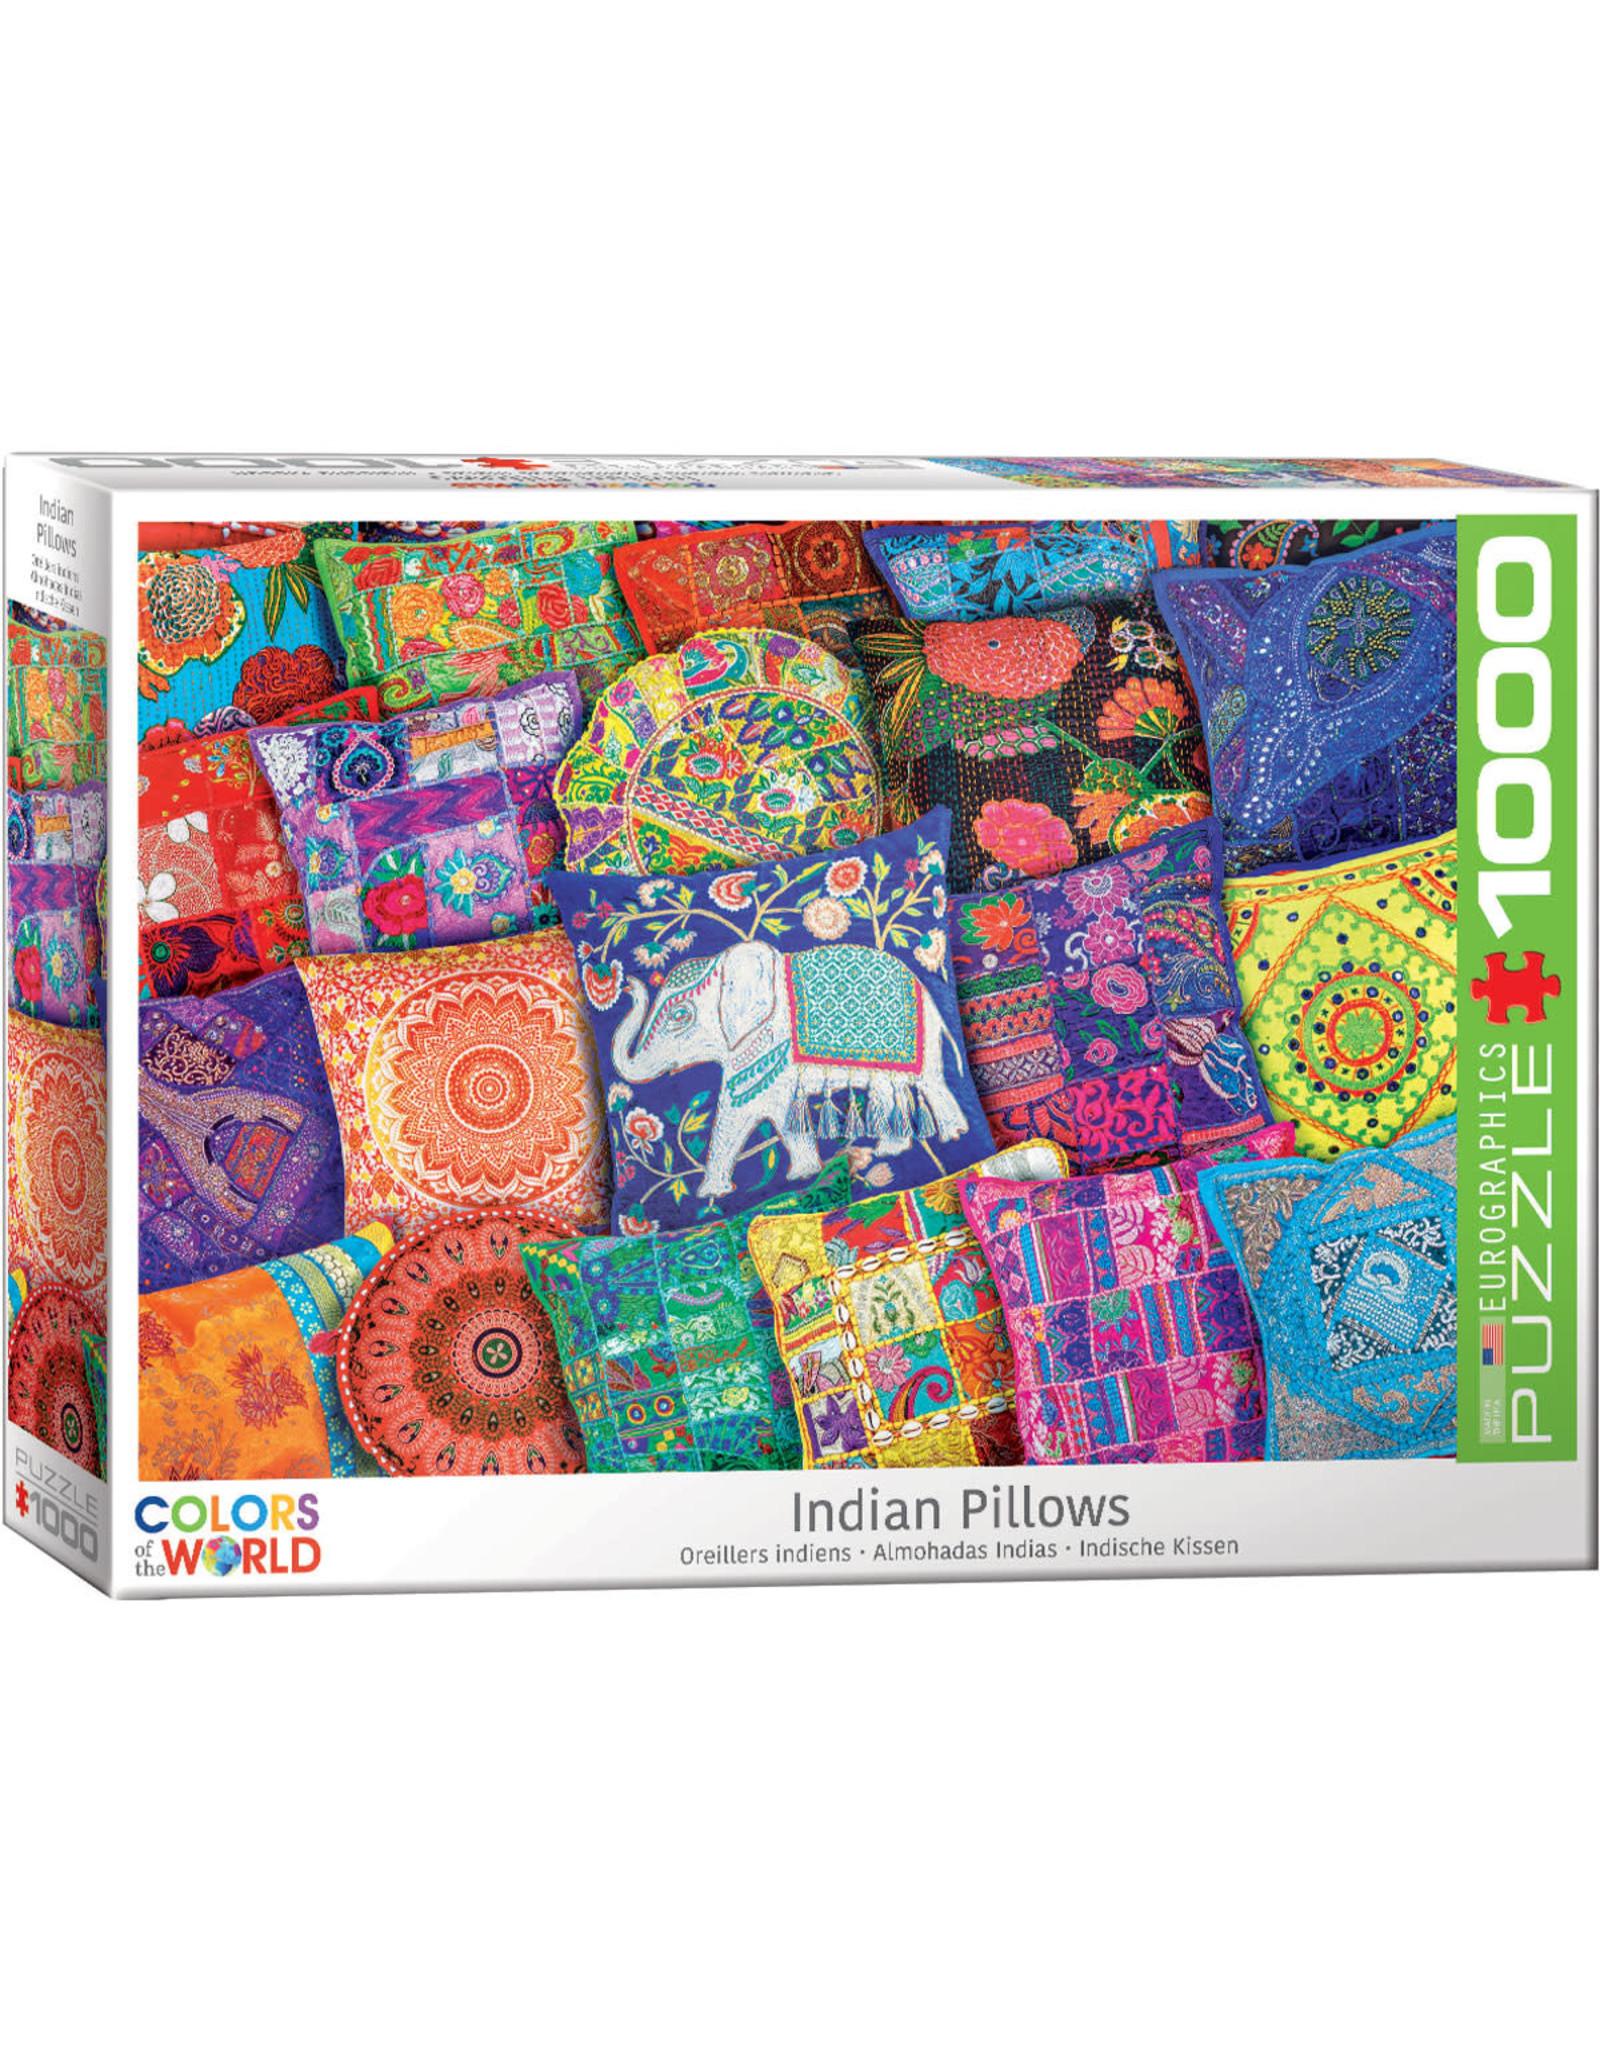 Eurographics Puzzles Indian Pillows 1000pc